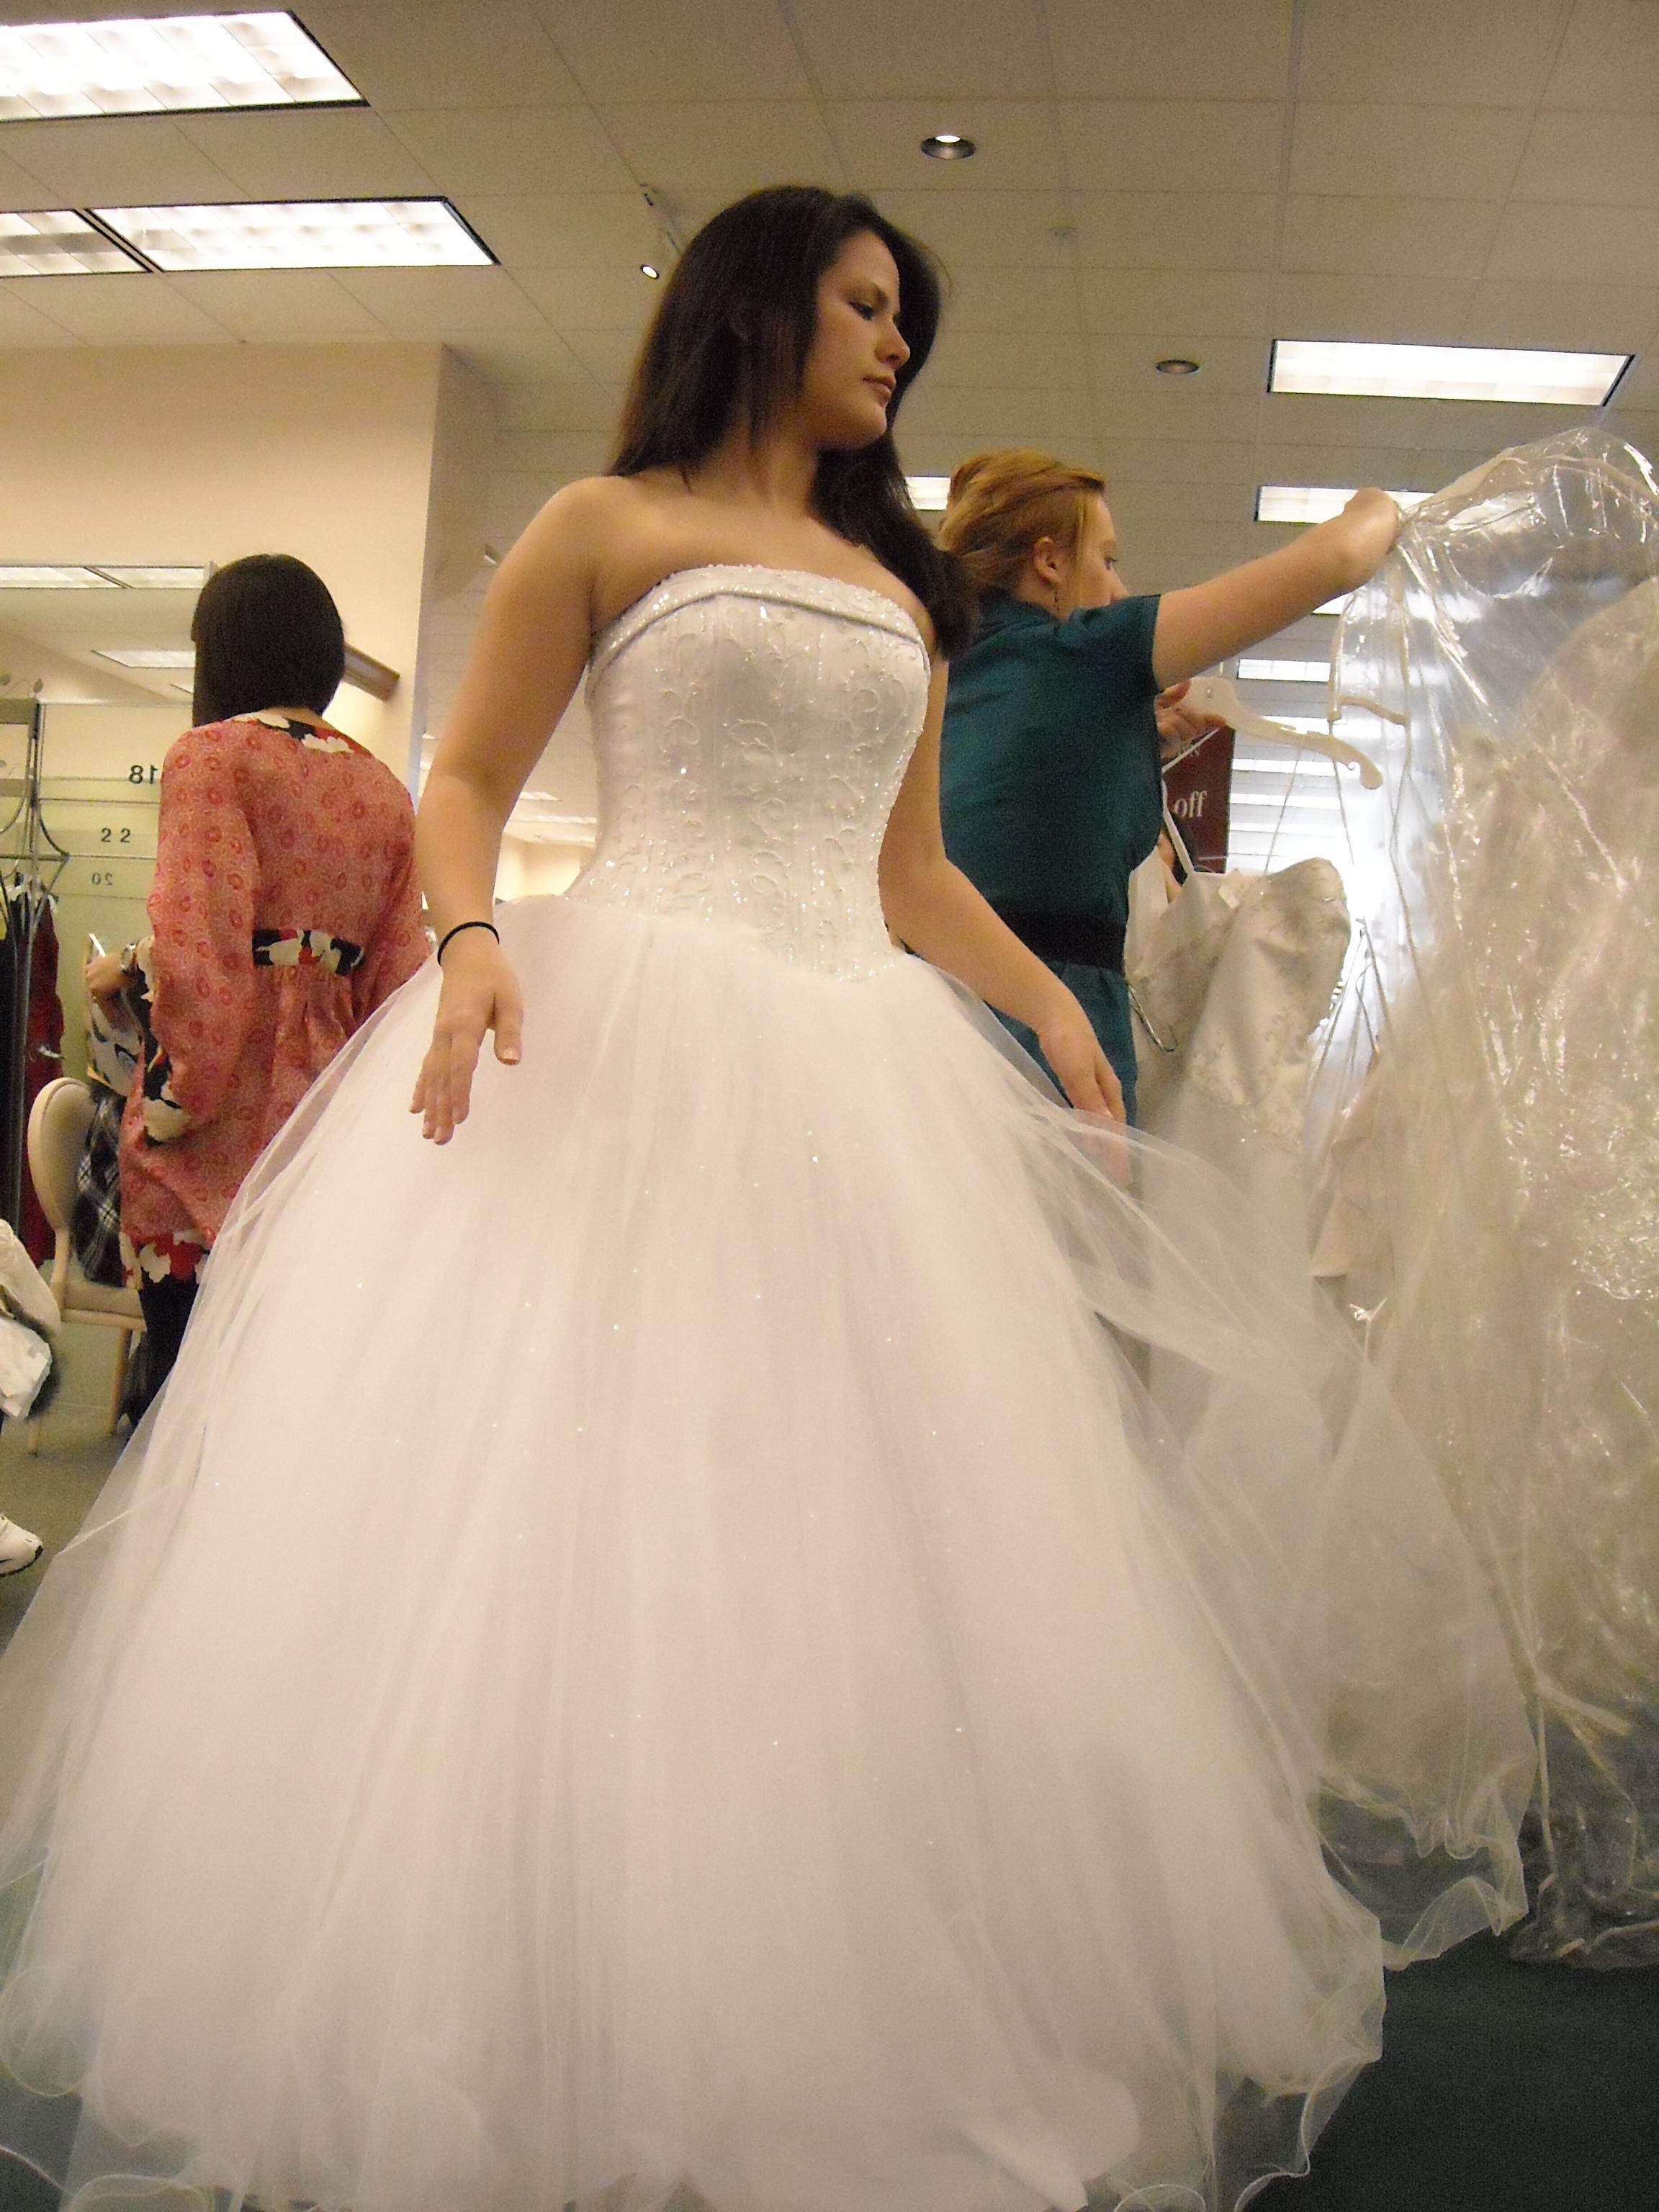 Ceremony, Flowers & Decor, Wedding Dresses, Ball Gown Wedding Dresses, Fashion, white, dress, Bridal, Princess, Ballgown, Tulle, Davids, tulle wedding dresses